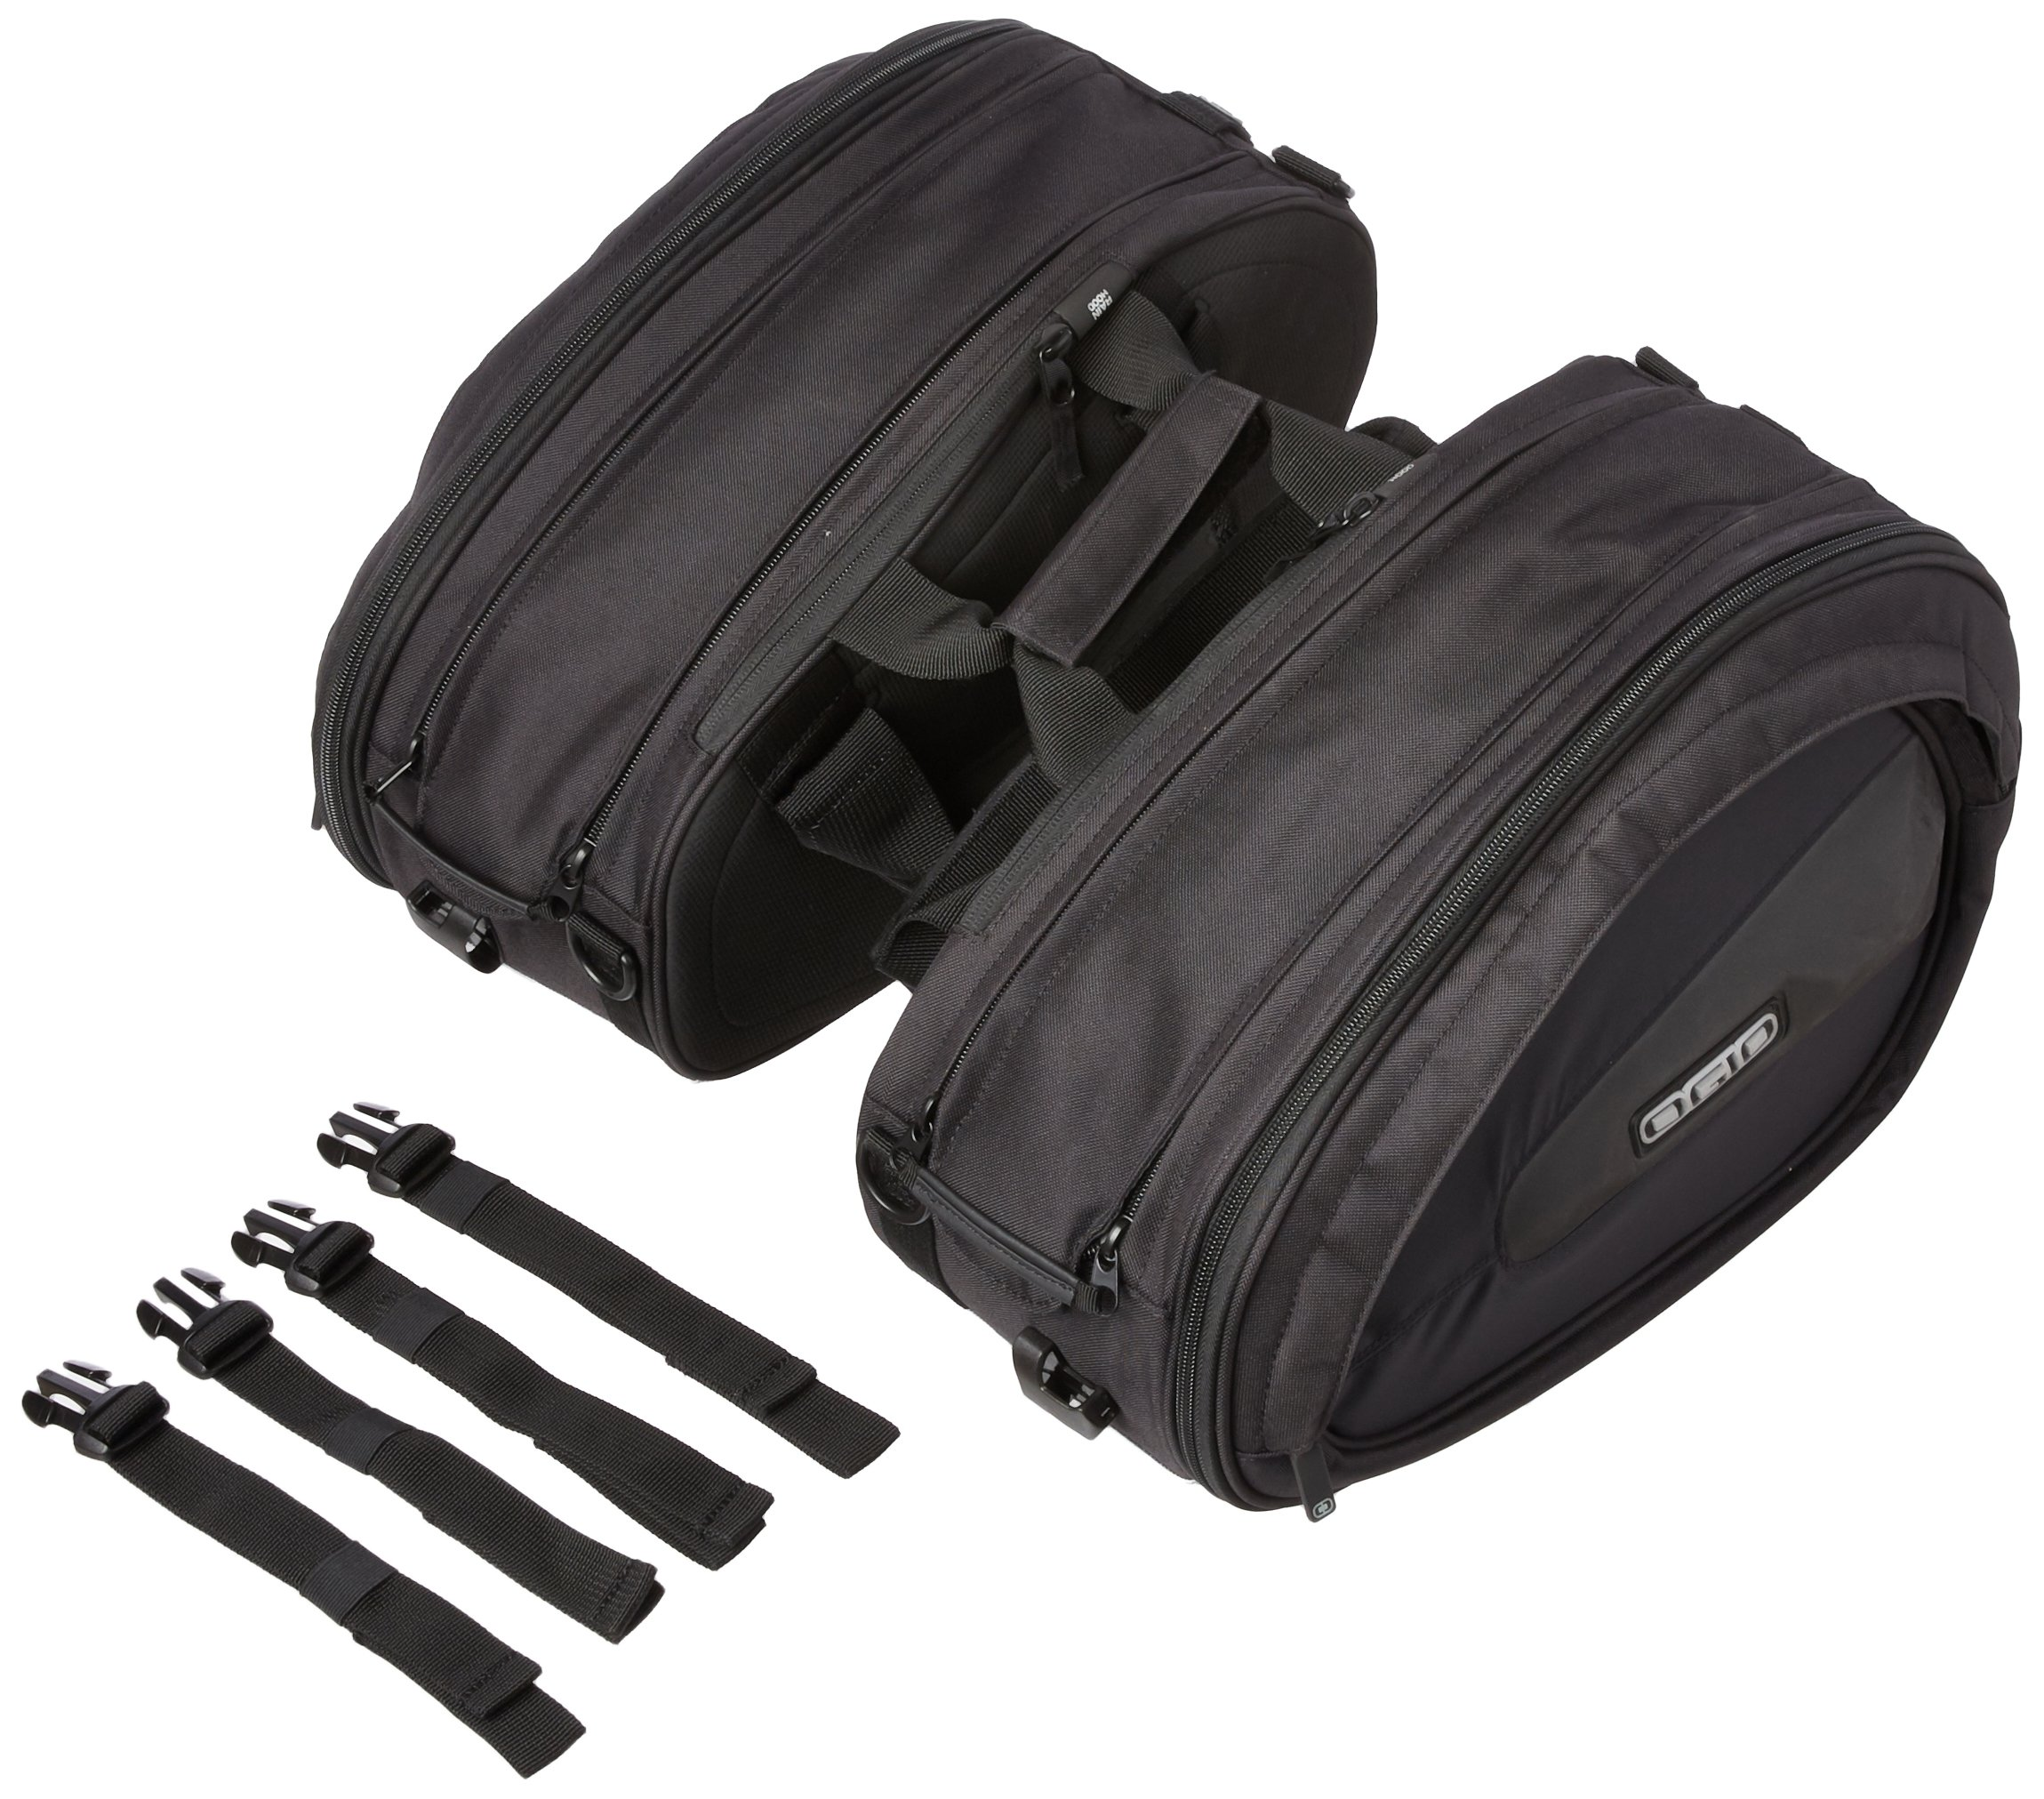 ogio 110093.36 Stealth Black Duffle Saddlebags